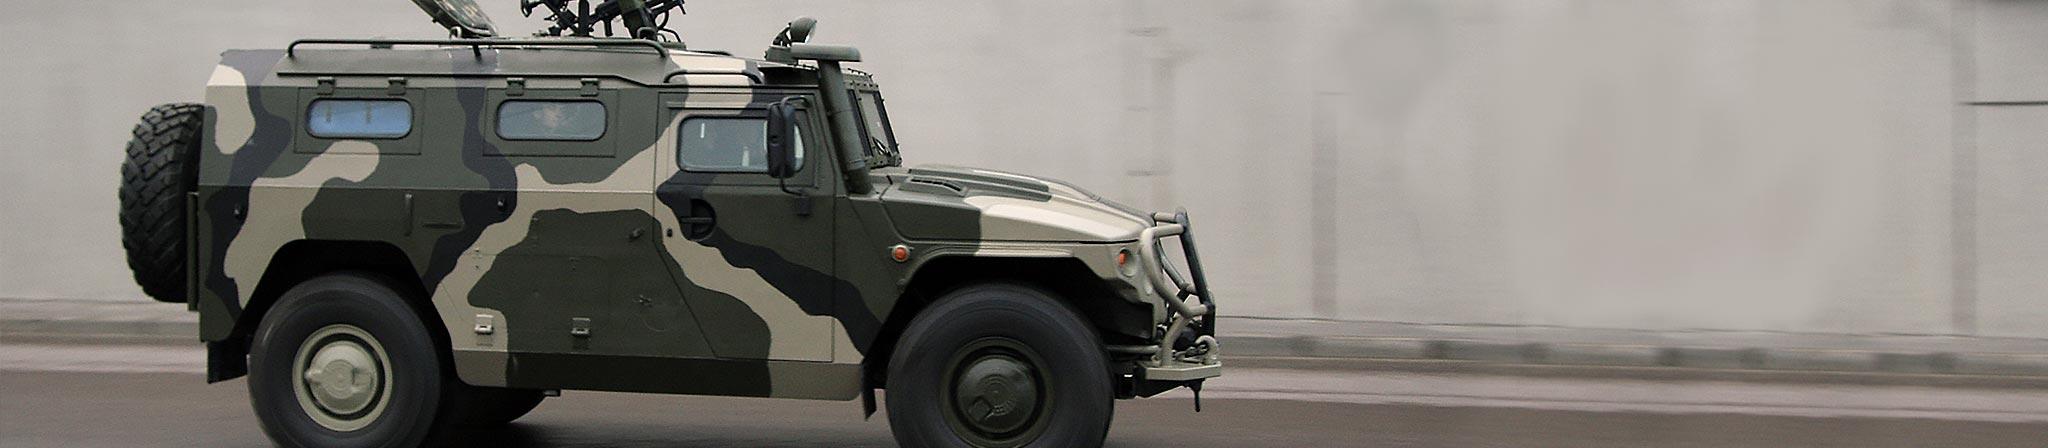 «Фургон–Комплект» поздравляет с Днем защитника Отечества!